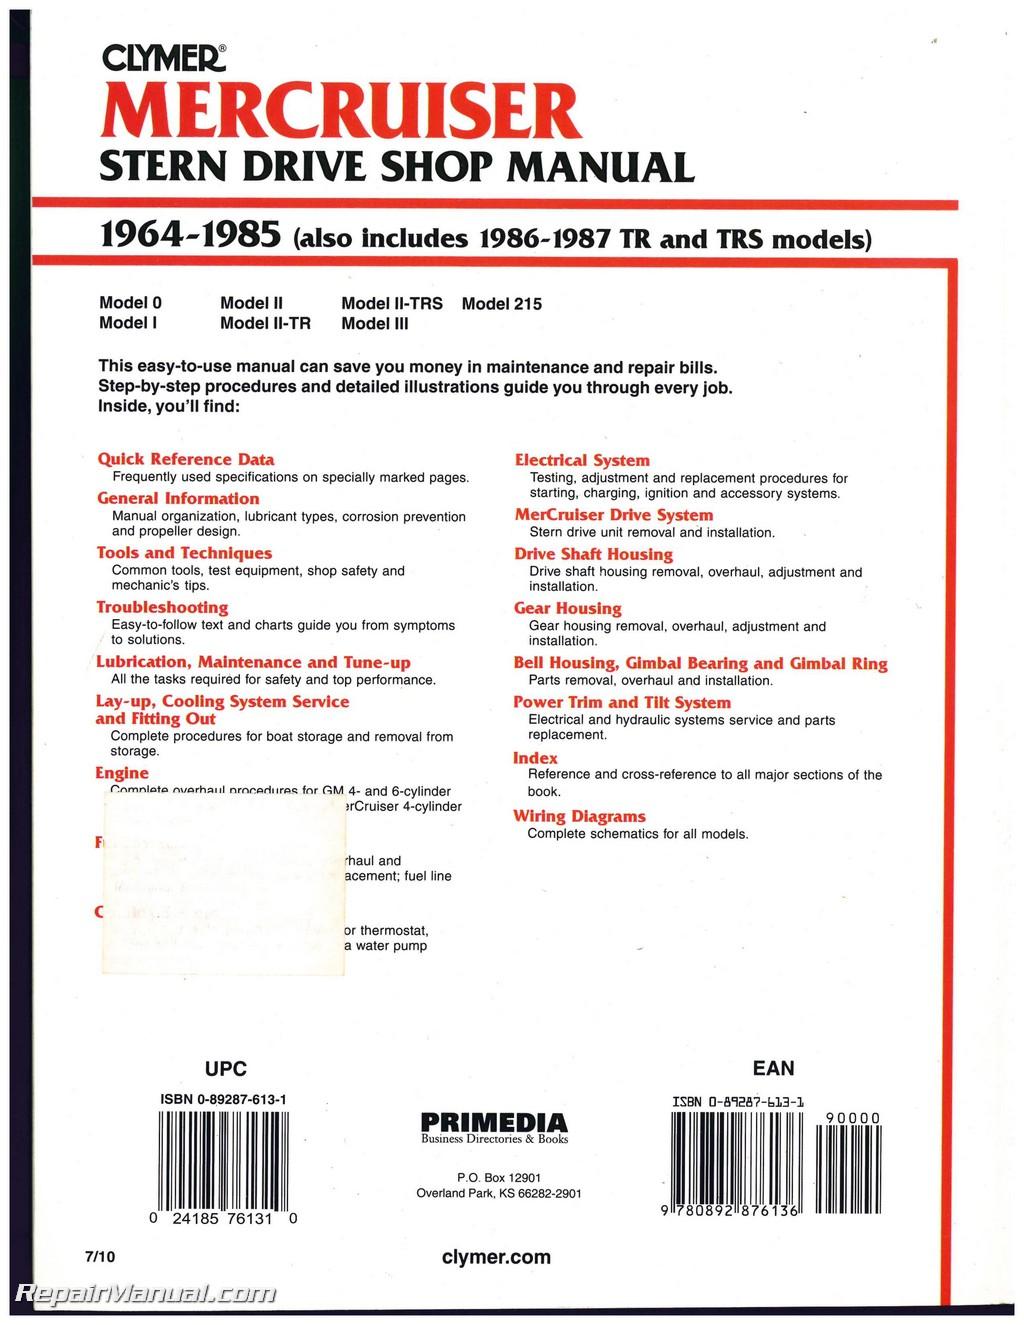 boat wiring diagrams manuals carter electric fuel pump diagram mercruiser stern drive engine shop manual 1964 1987